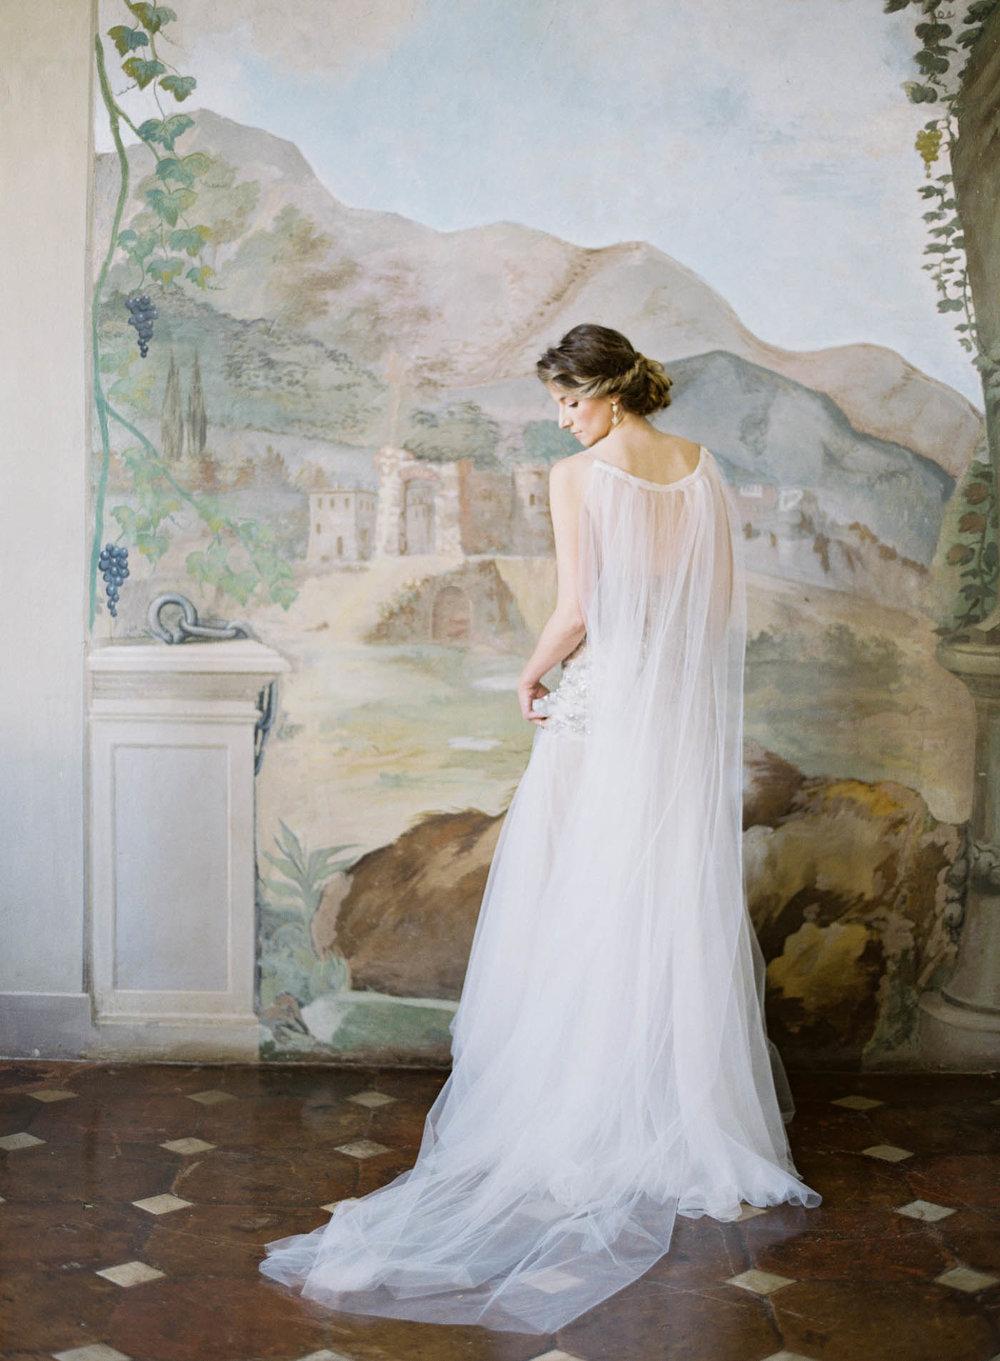 Villa_Cetinale_Wedding-16-Jen_Huang-ElanJacob-147-Jen_Huang-007315-R1-013.jpg